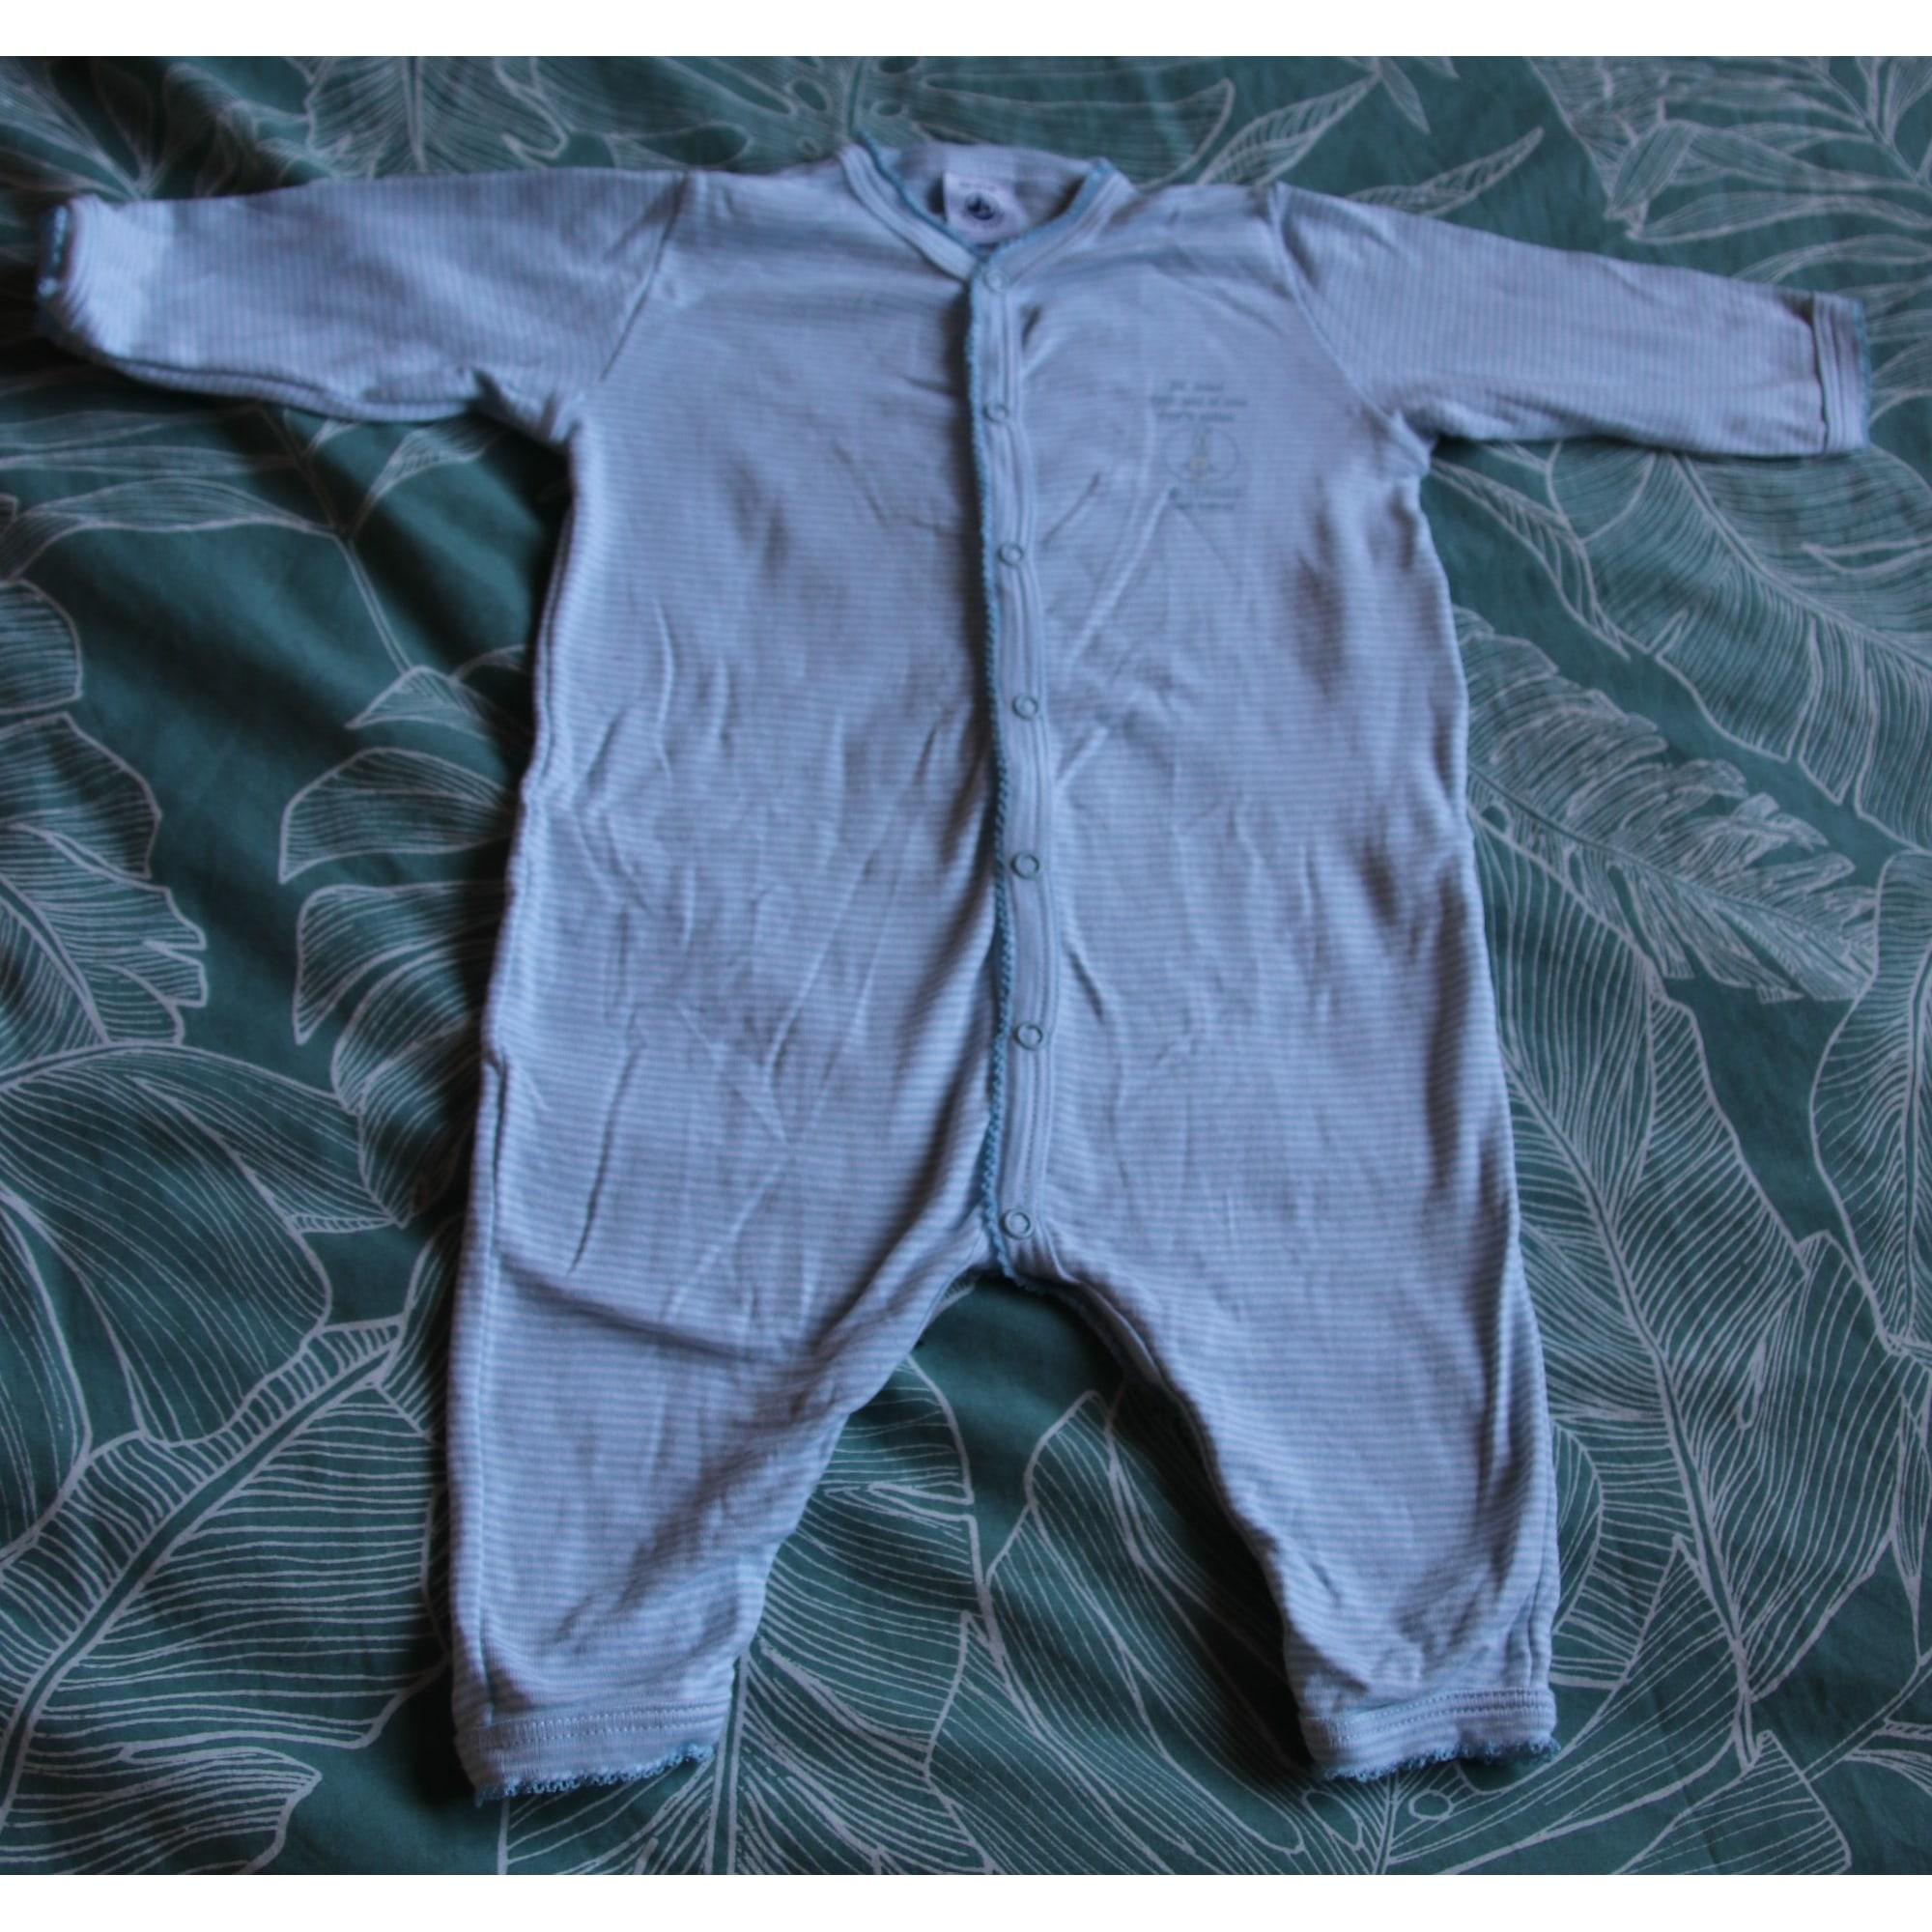 Grenouillère, babygros PETIT BATEAU Bleu ciel et blanc